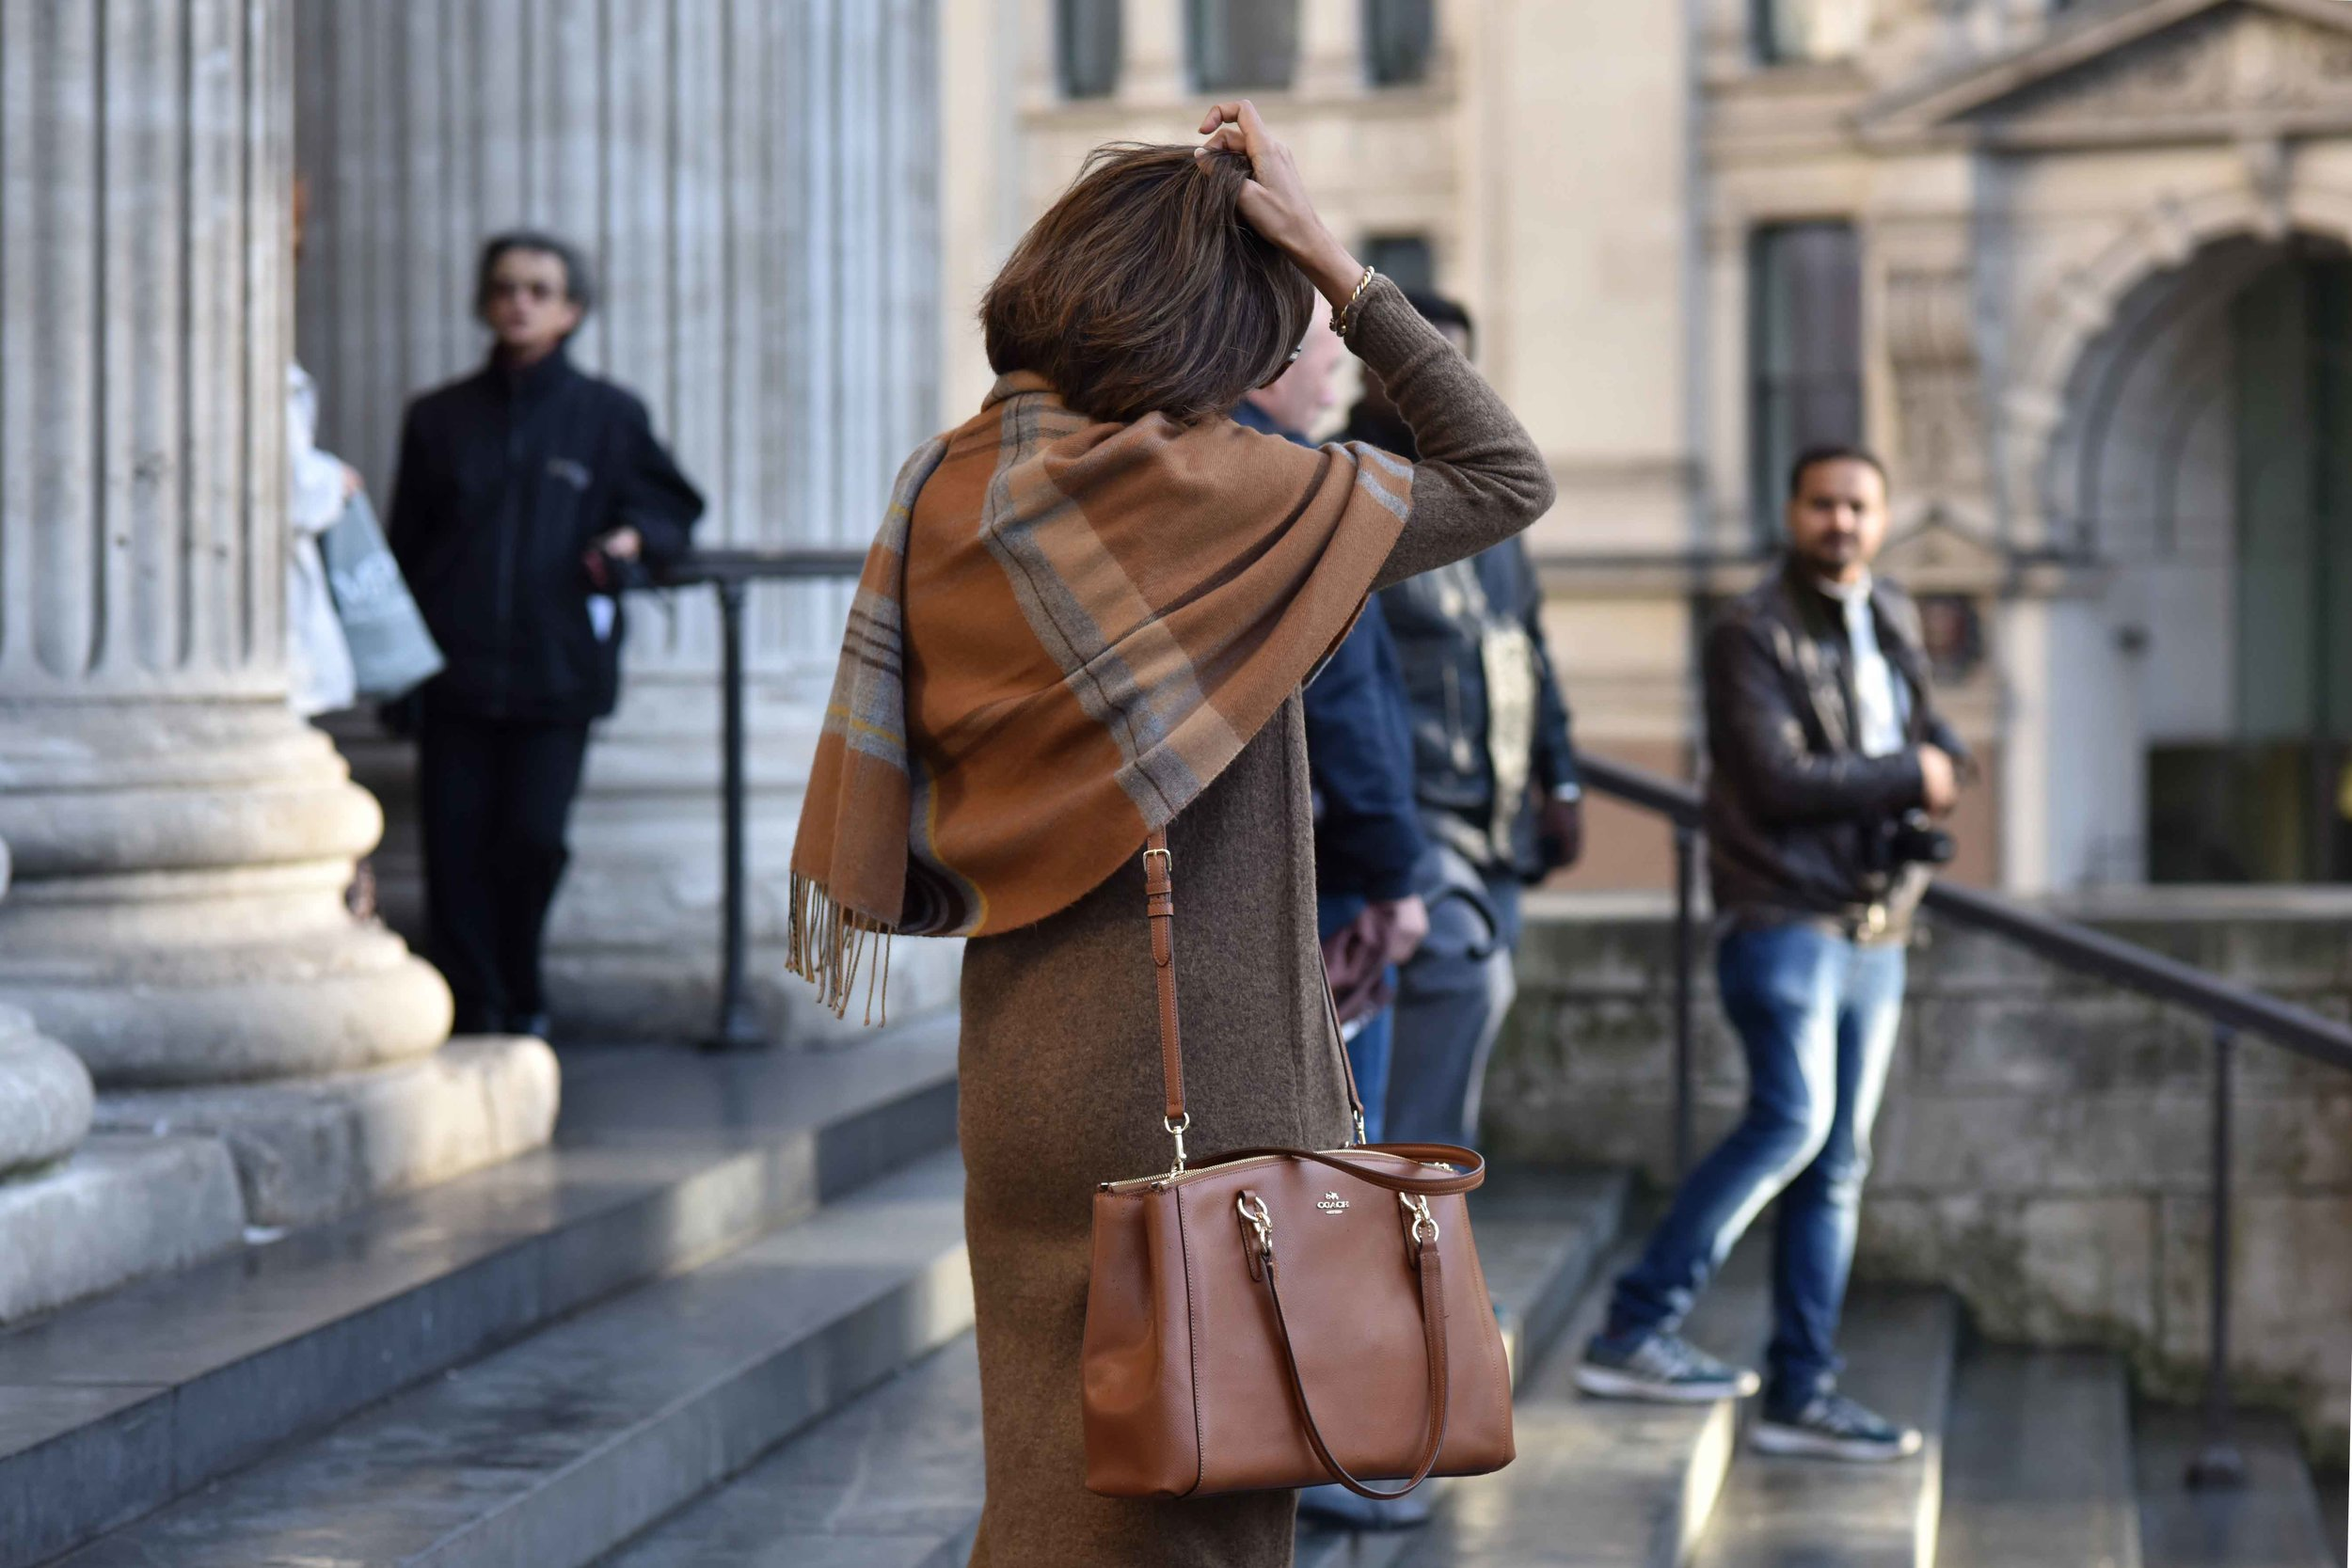 Marks & Spencer sweater dress, Marks & Spencer plaid scarf, Coach handbag. Photo: Alizeh Latif. Image©sourcingstyle.com.